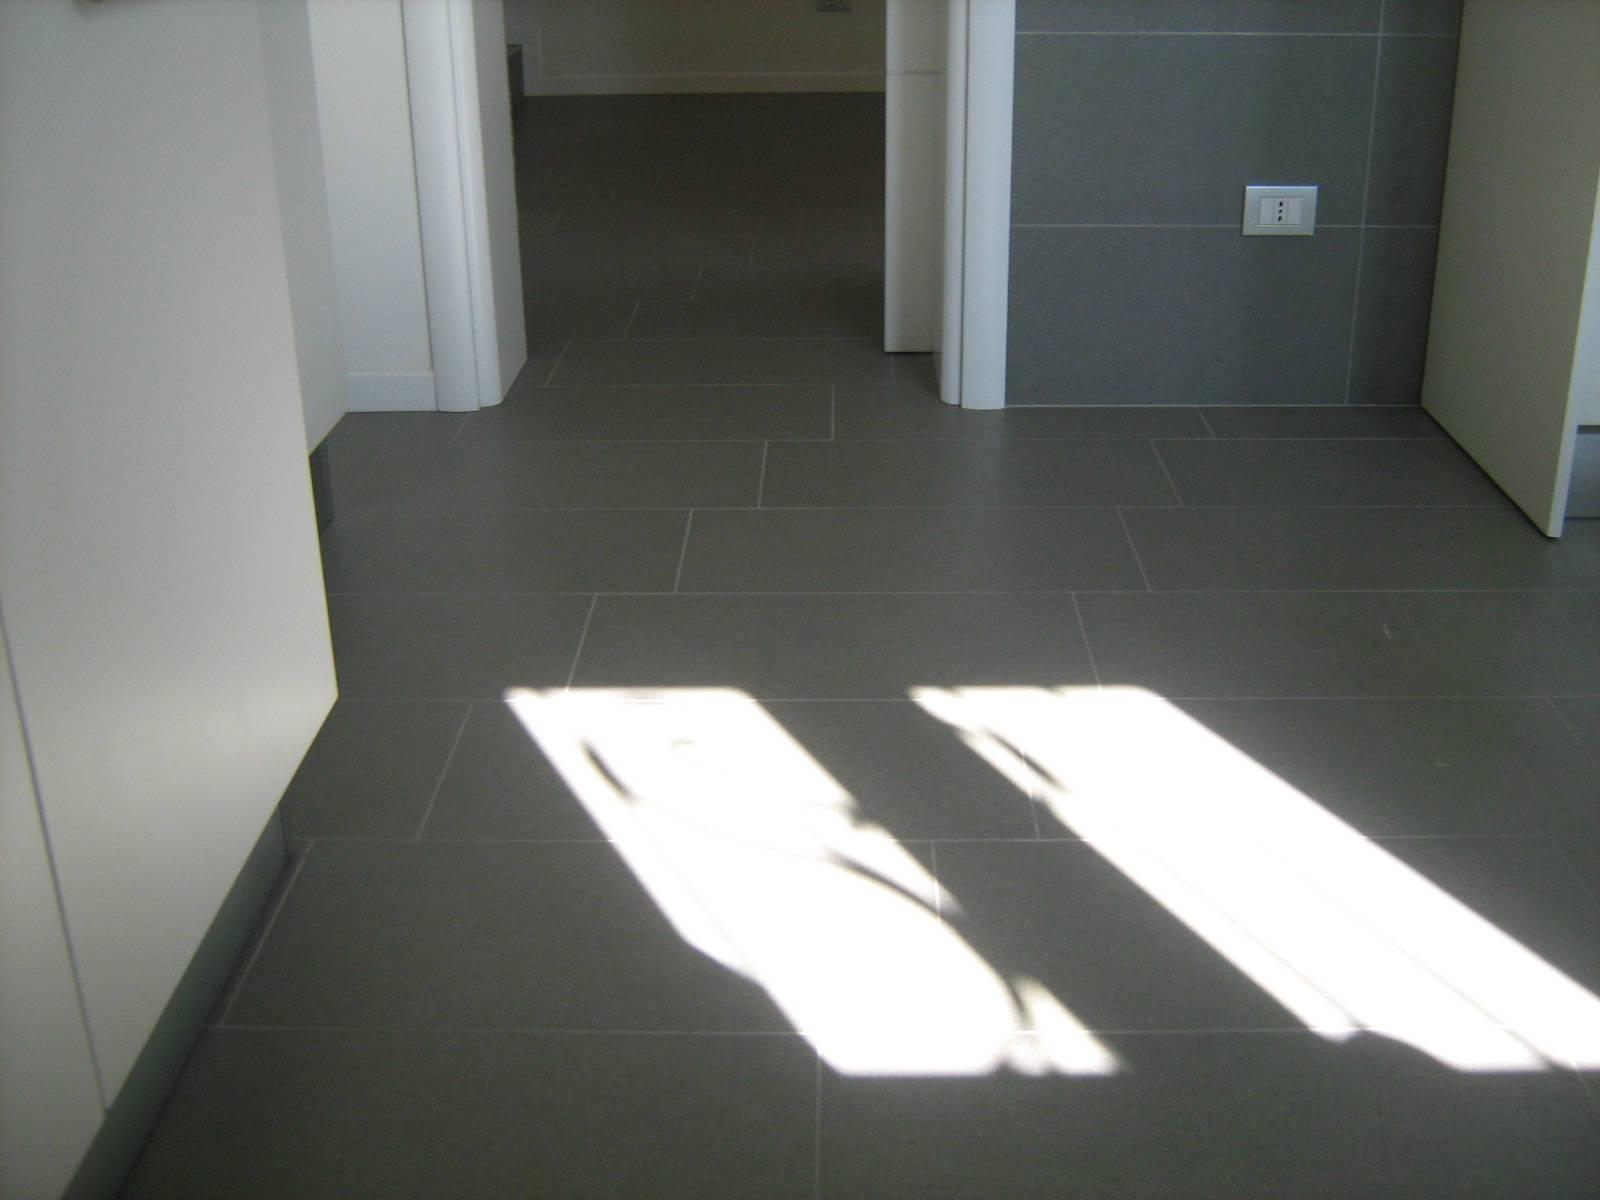 pavimento grigio cemento